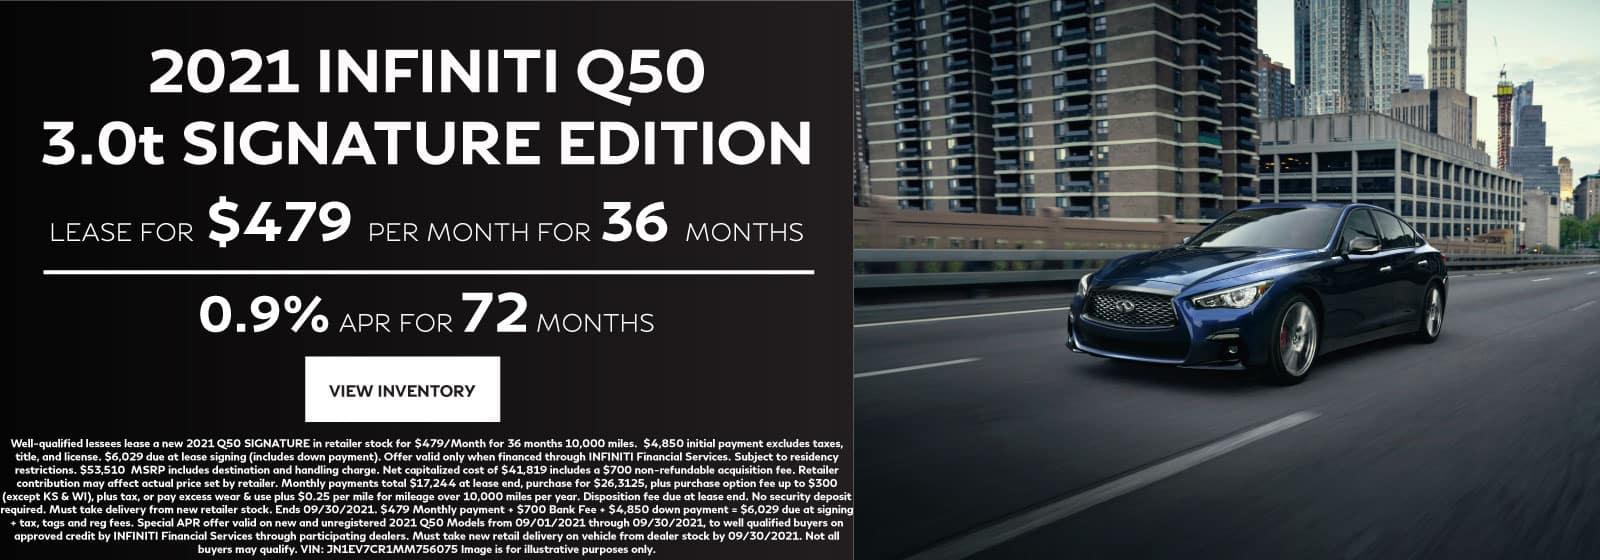 INFINITI Q50 Signature Edition Lease Offer